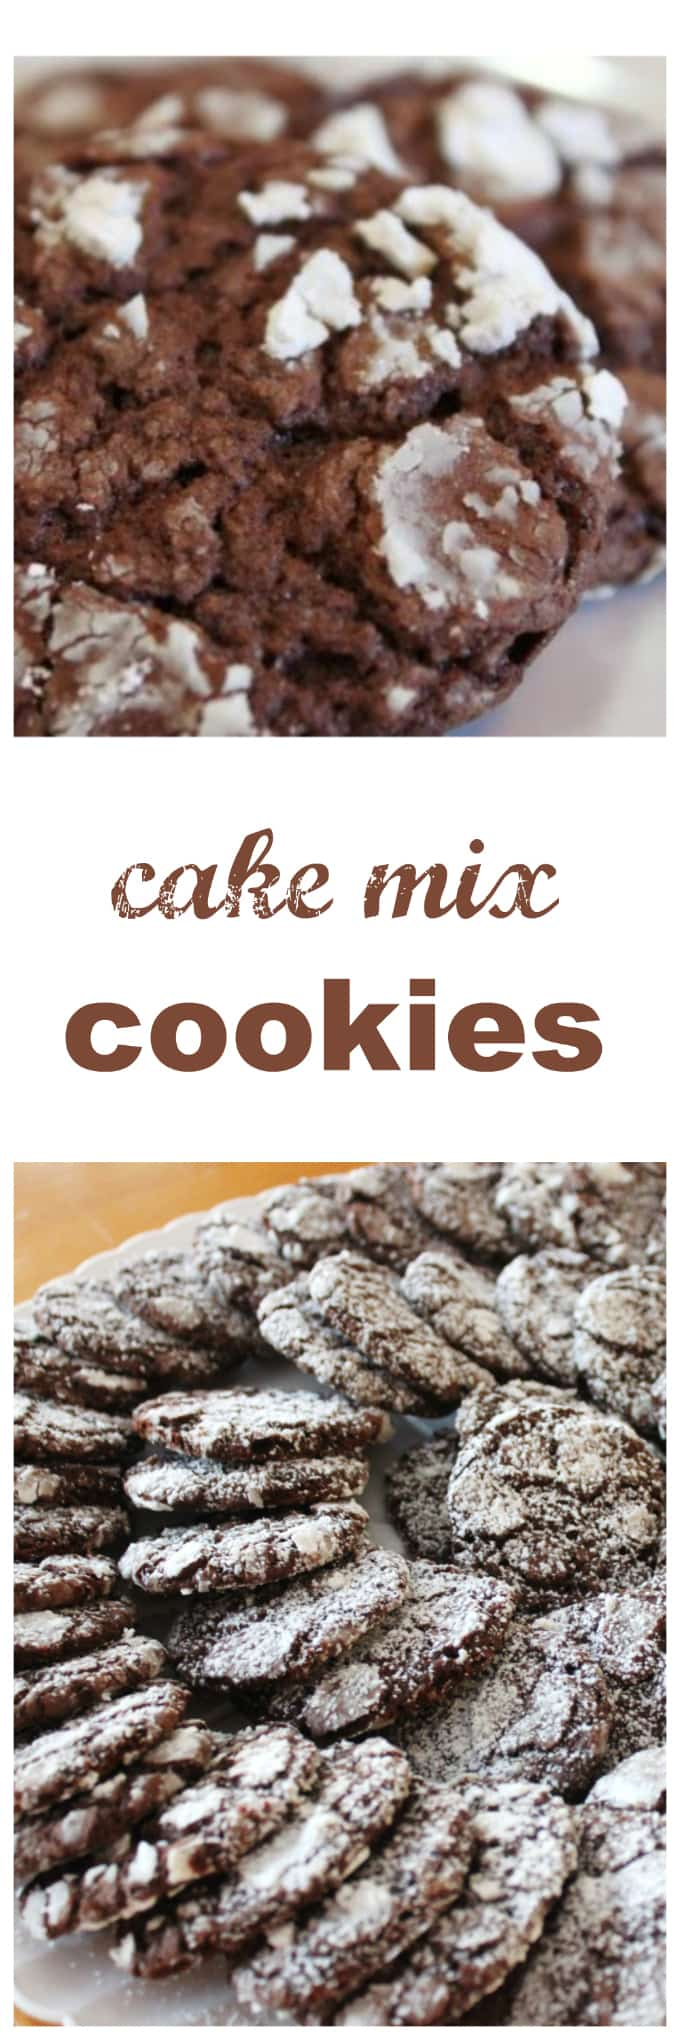 cake mix cookies @createdbydiane